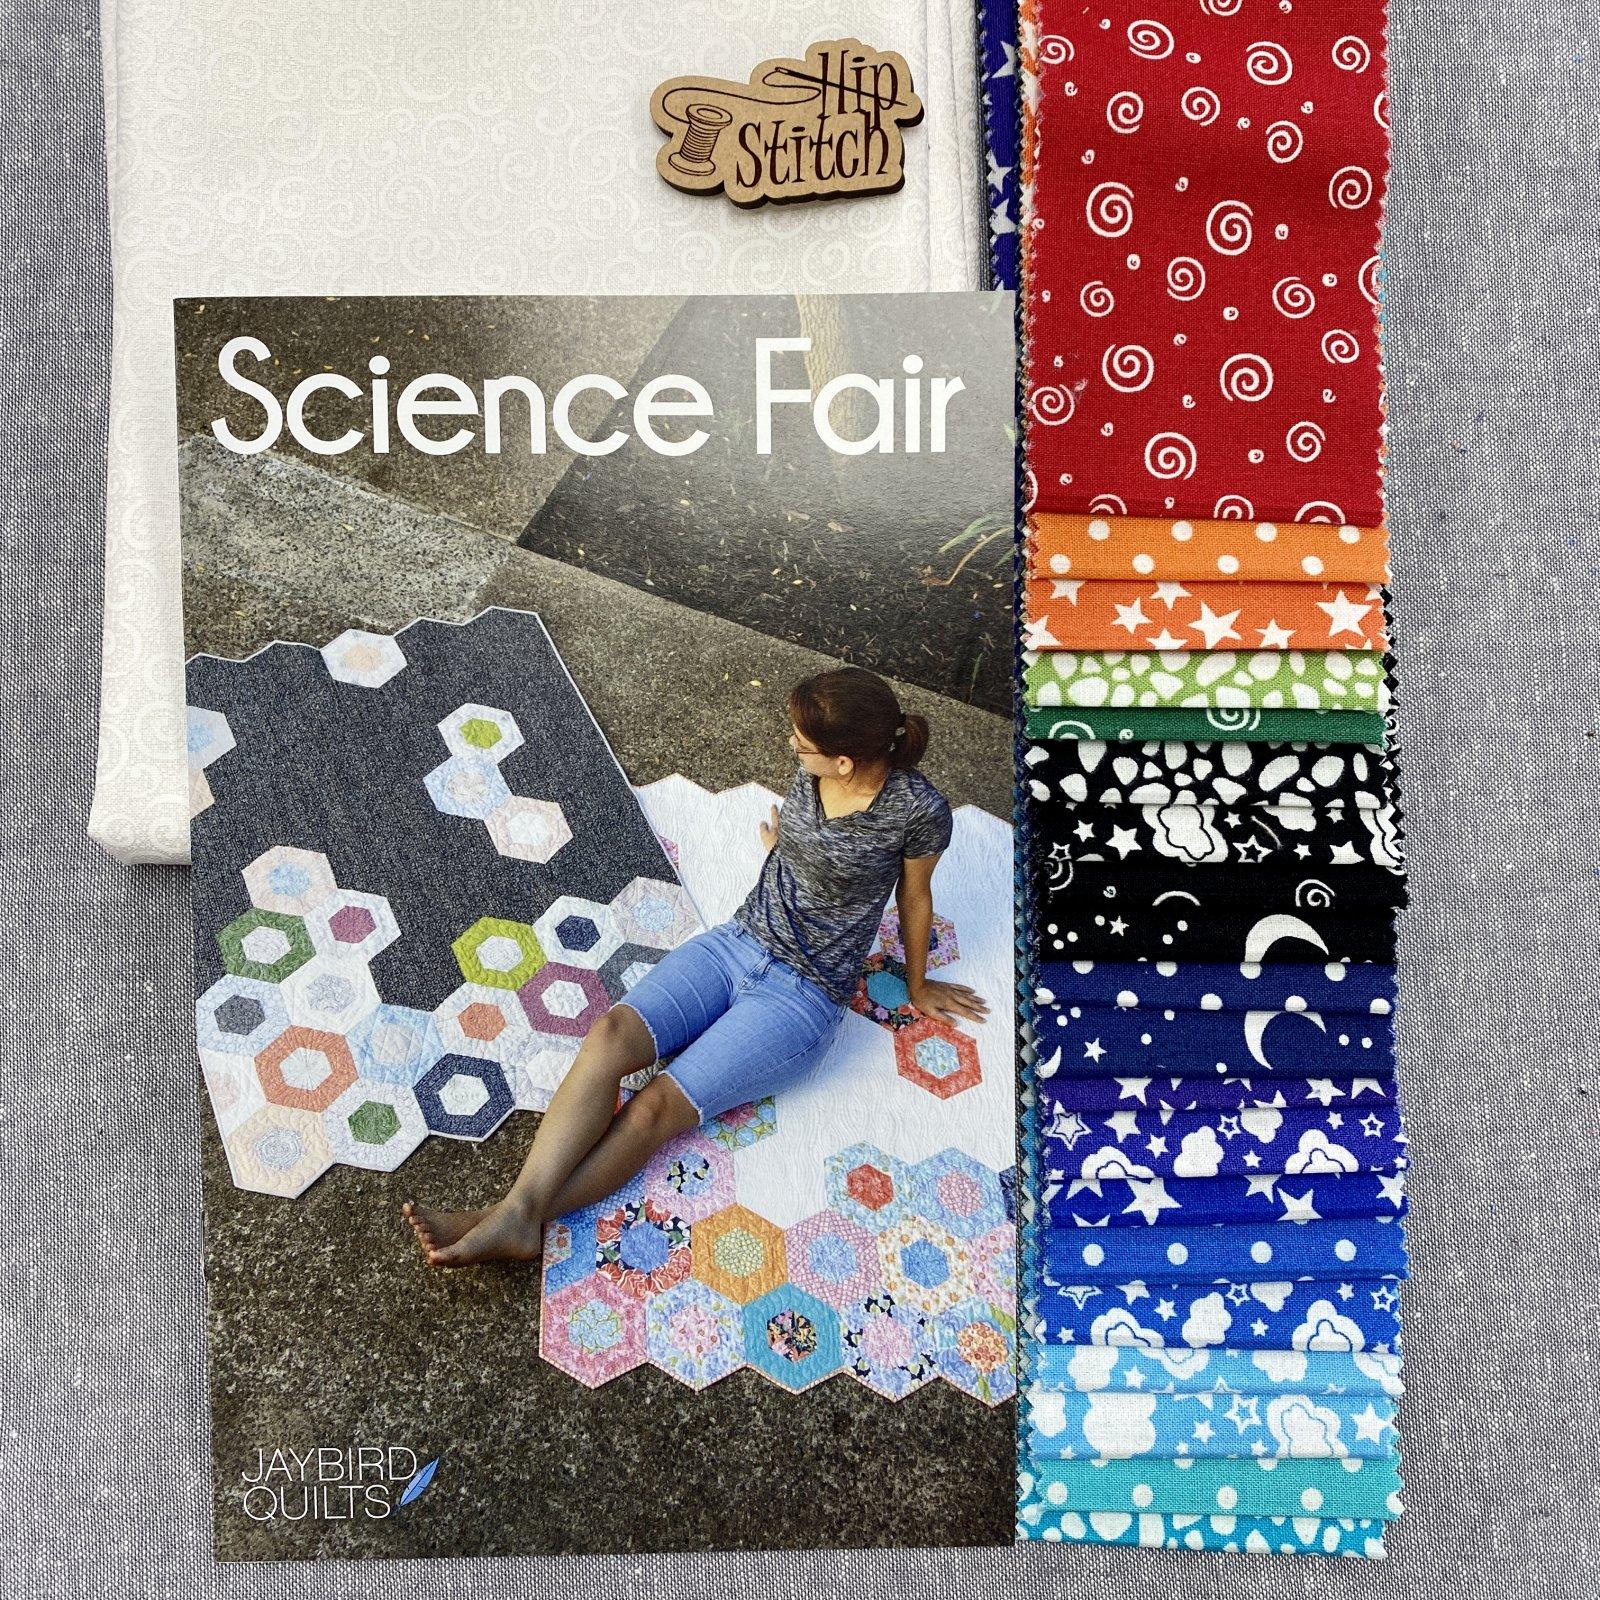 Science Fair Glow in the Dark Quilt Kit